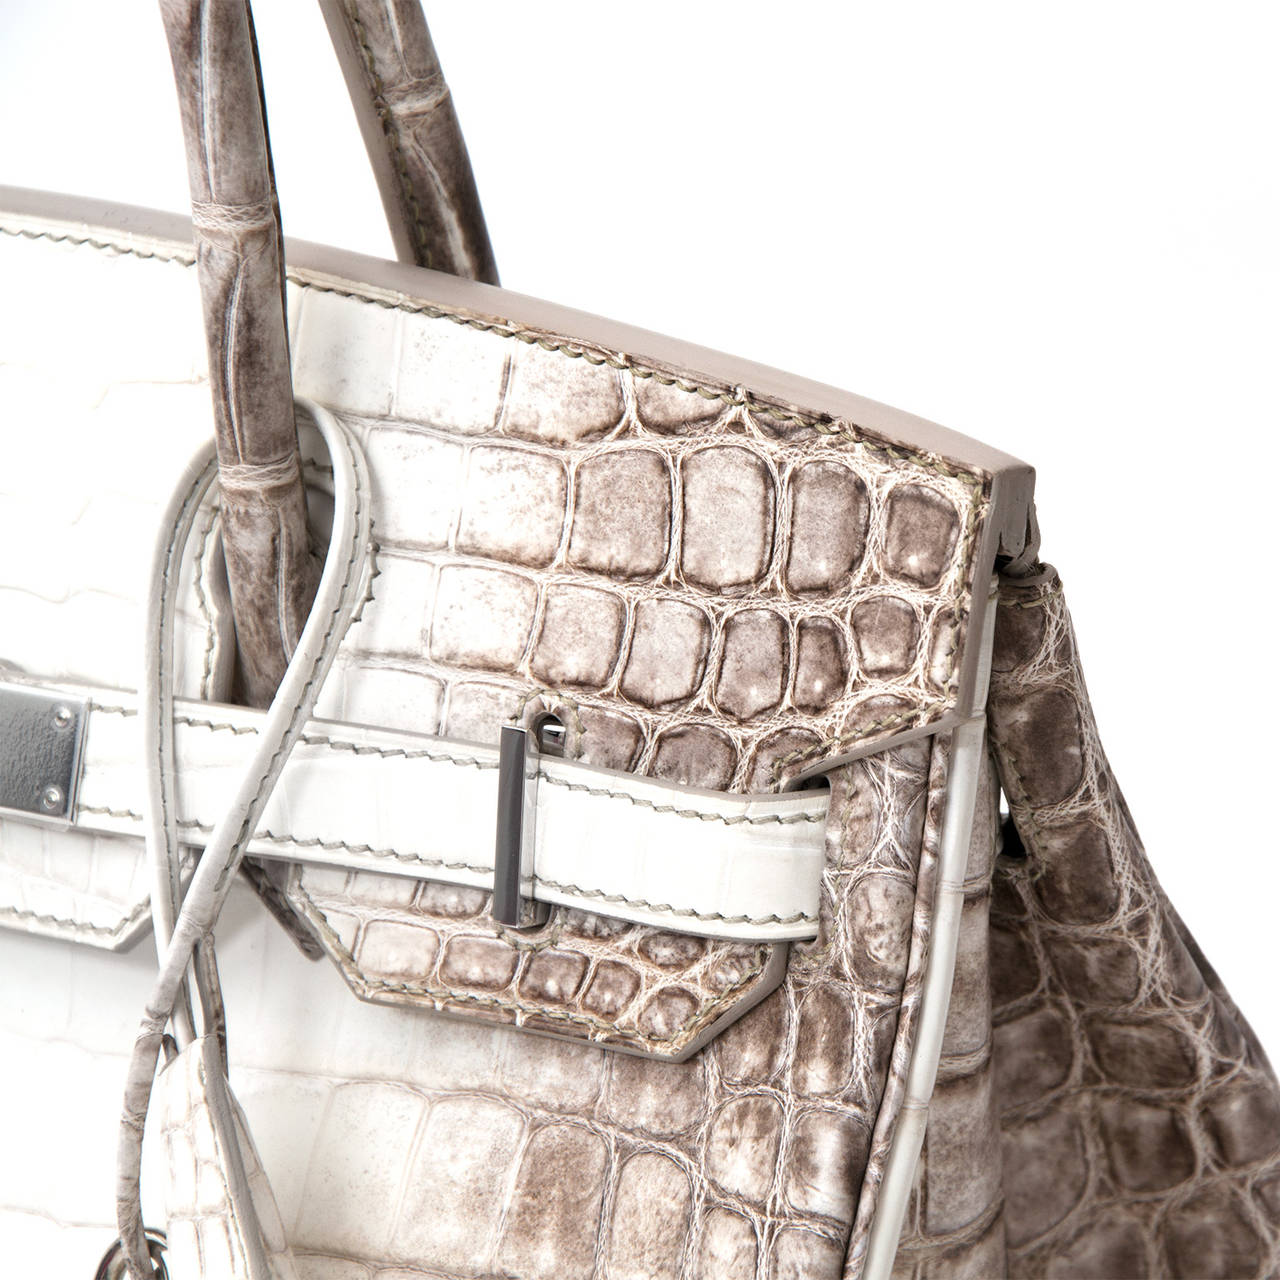 57bbd52d25 Hermès Birkin Bag Crocodile Niloticus Himalaya Handbag White PHW 30 For  Sale 2